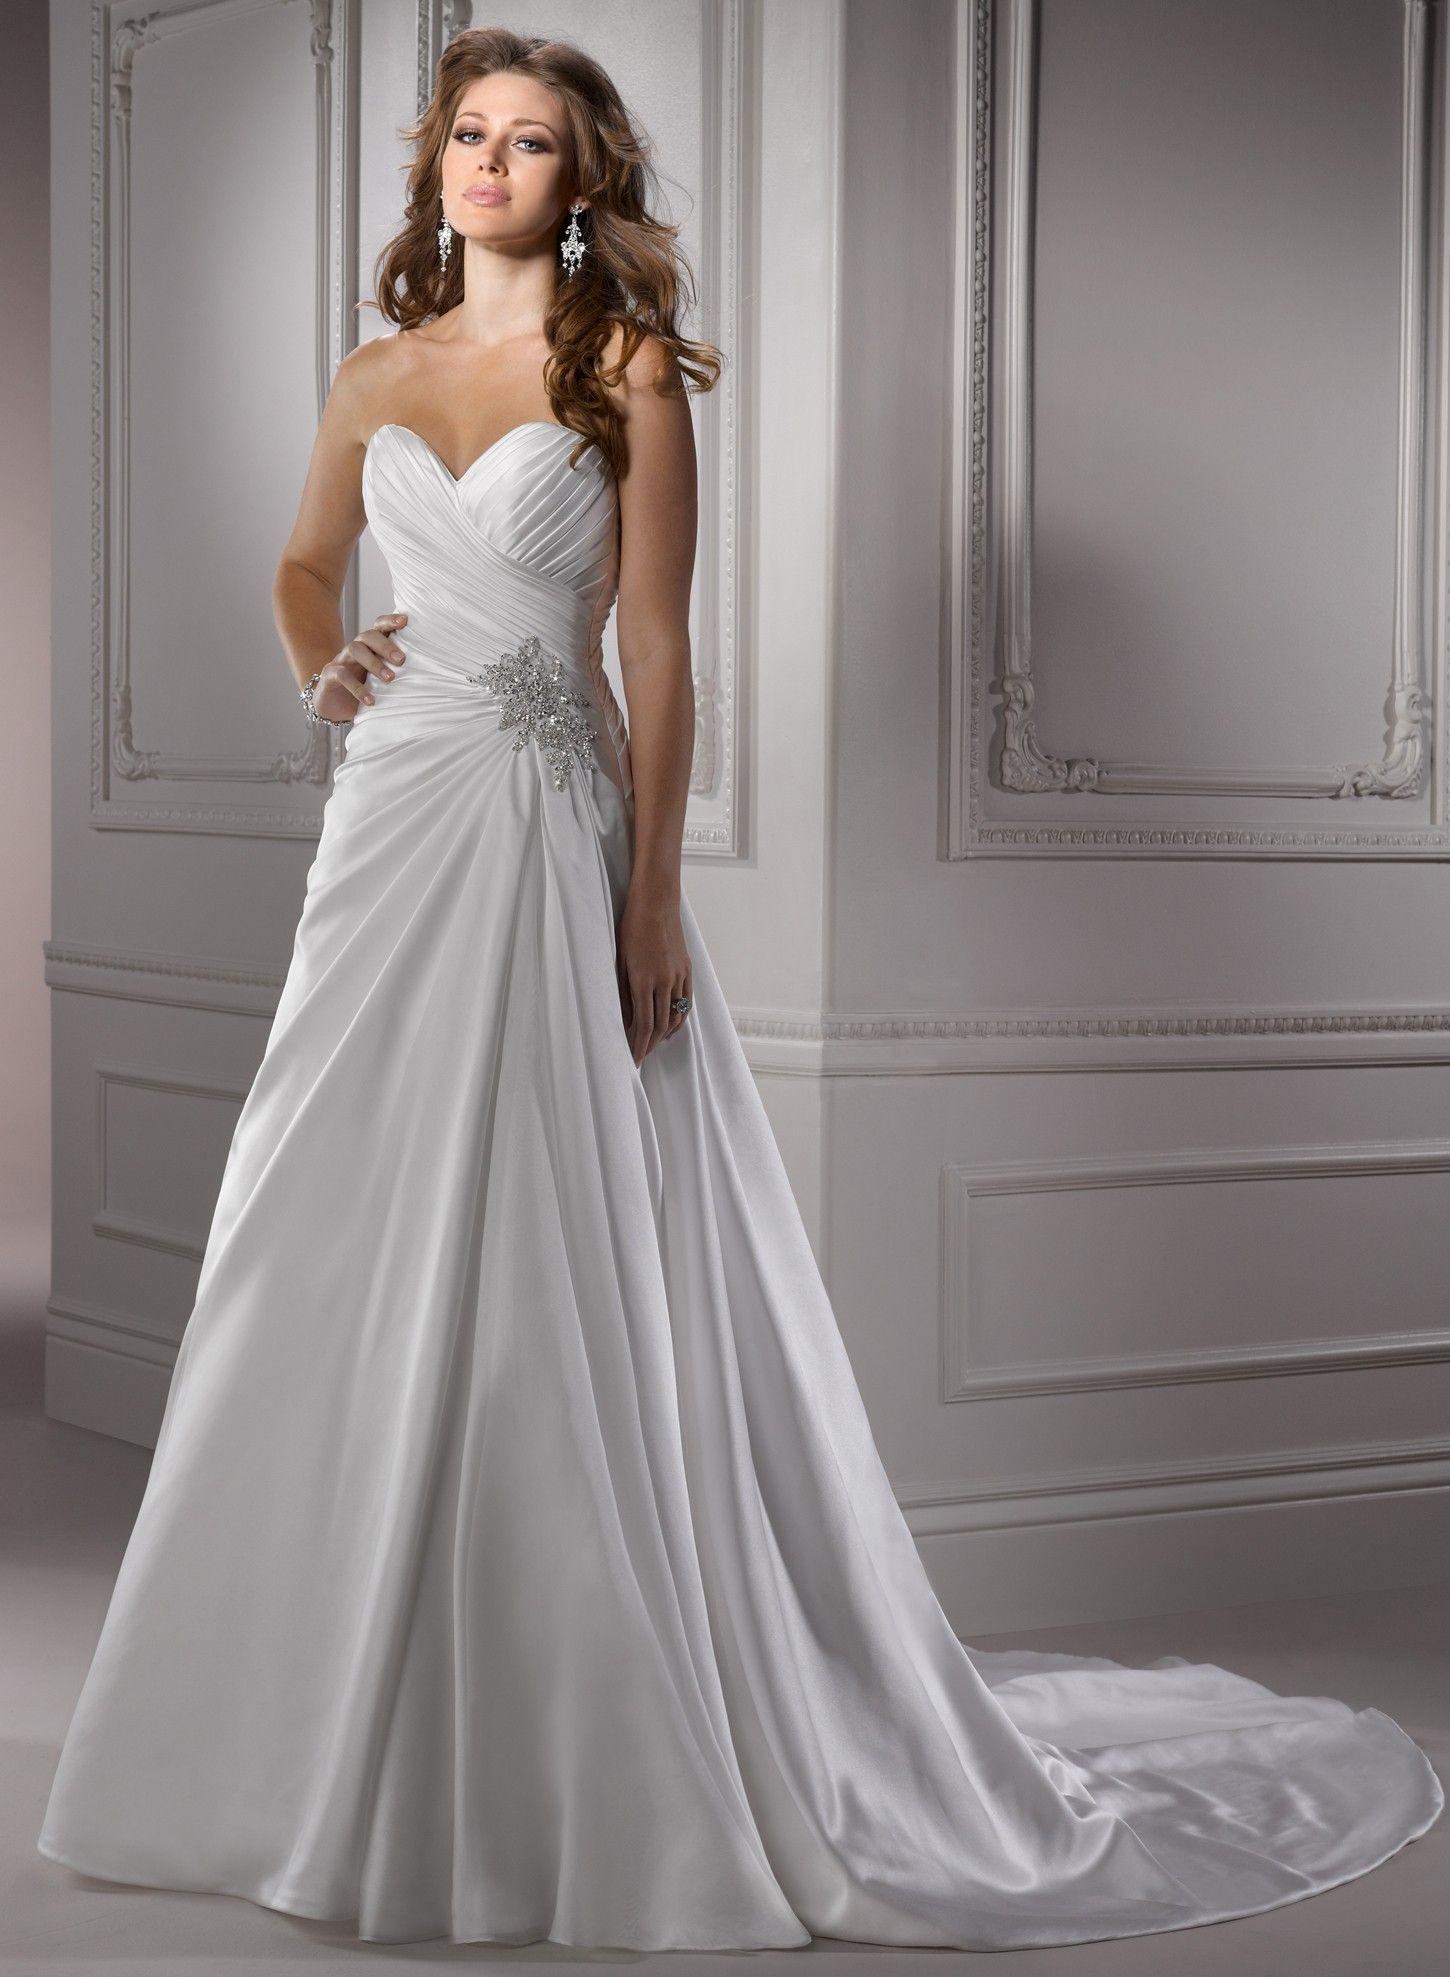 Amour Satin Sweetheart Neckline A Line Wedding Dress